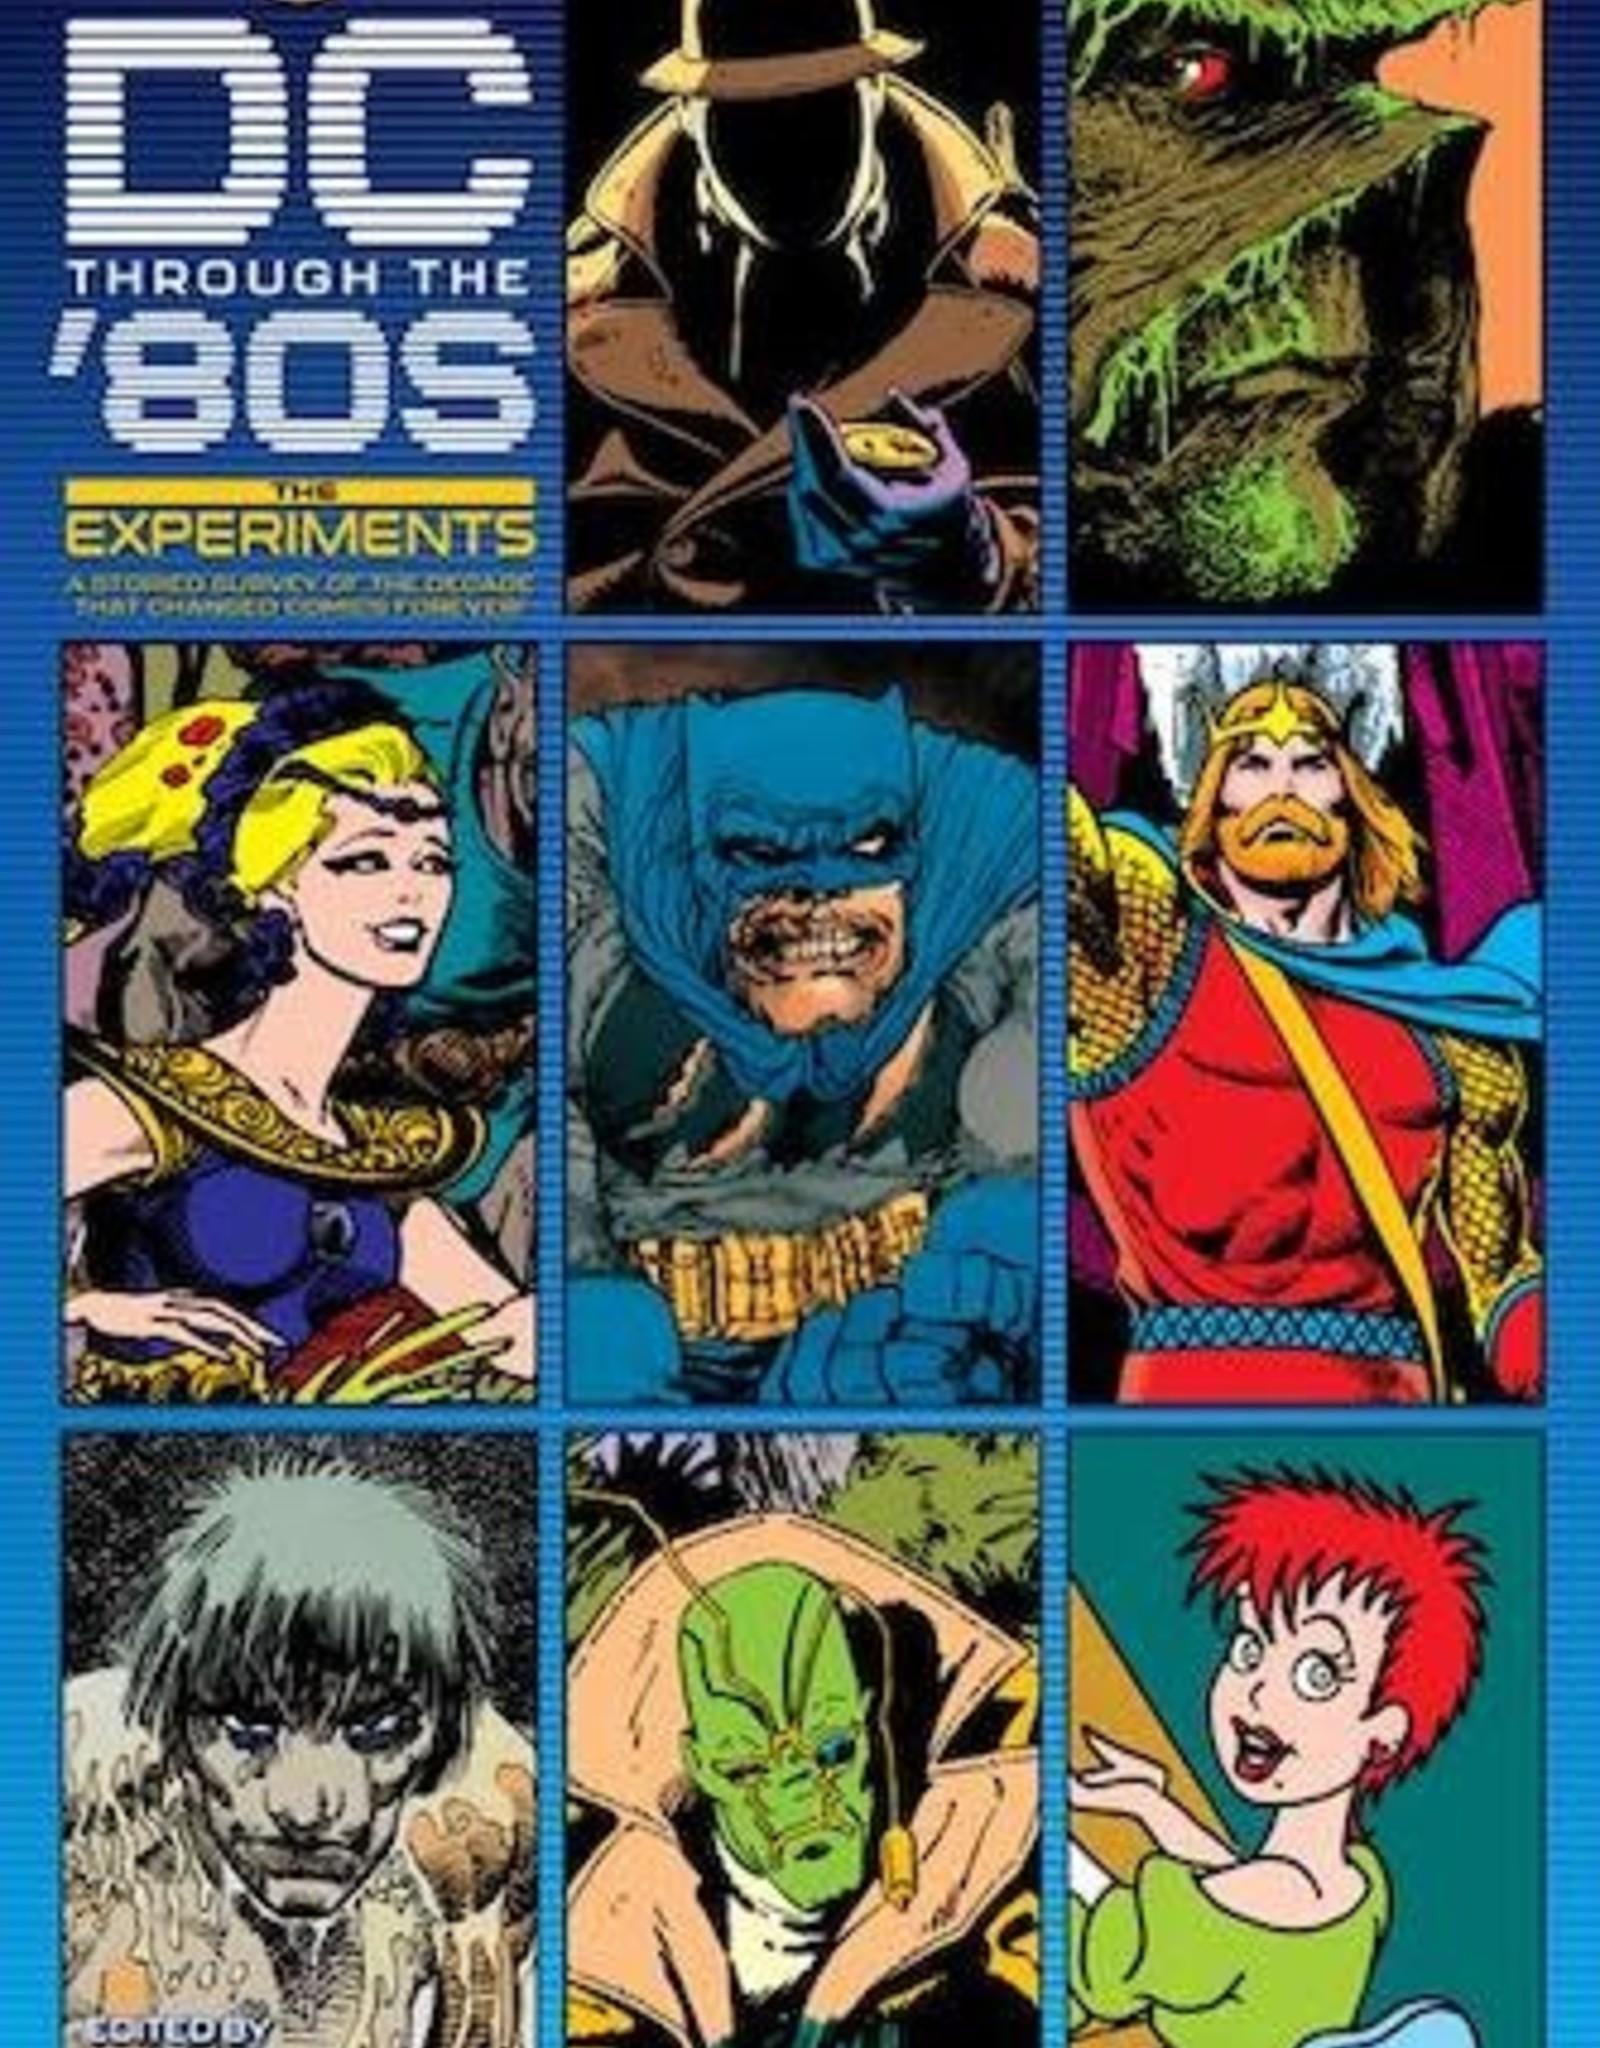 DC Comics DC Through The 80s: The Experiments HC